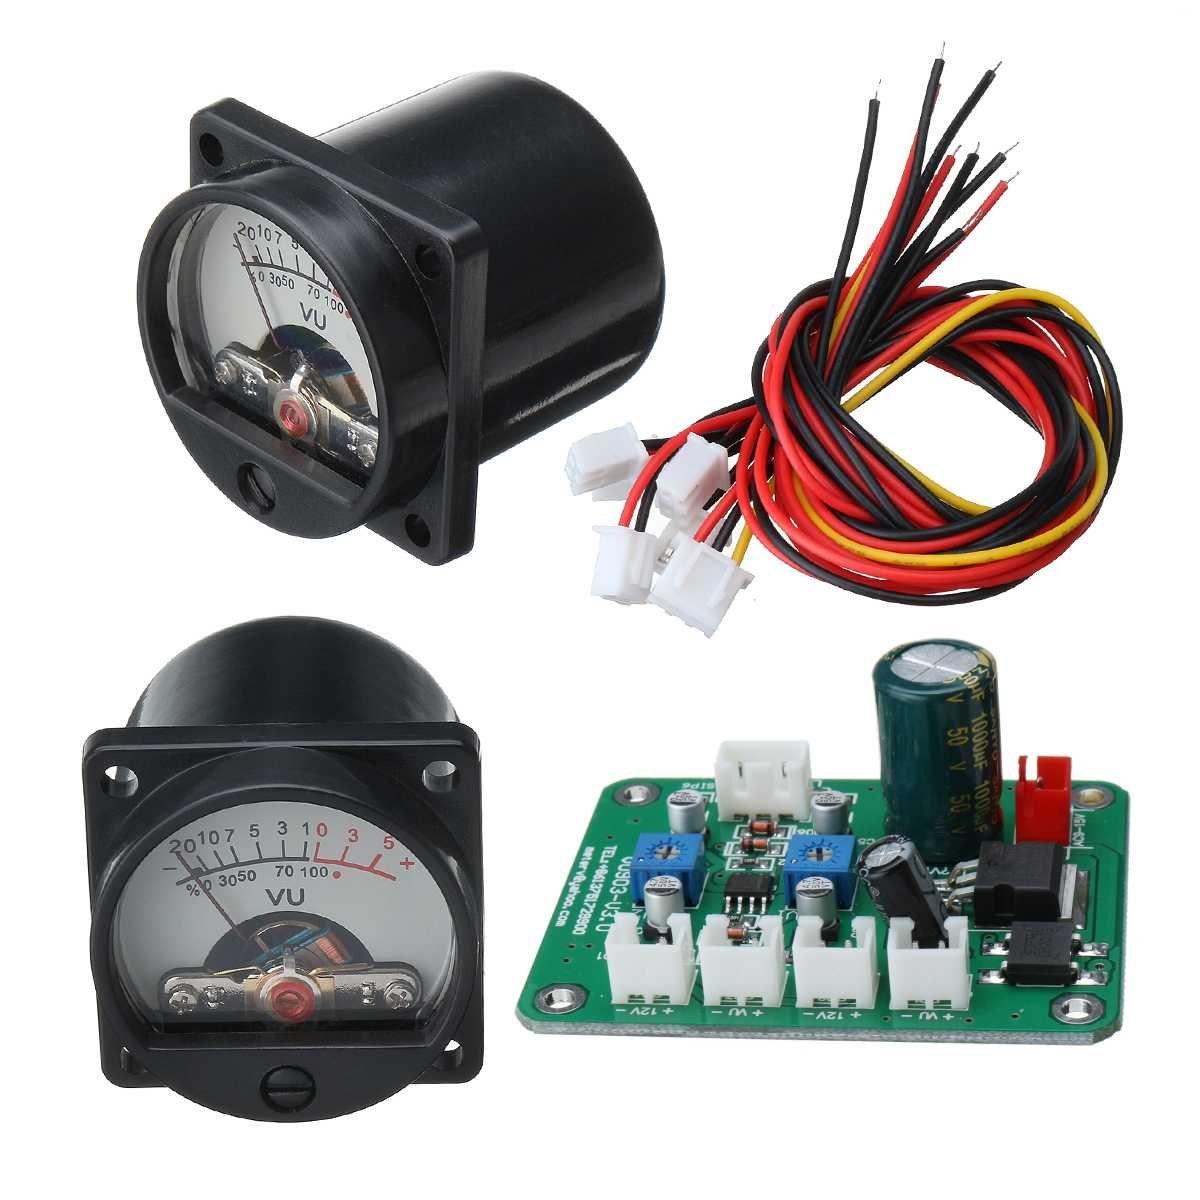 2pc 10-12V VU Panel Meter 500UA Warm Back Light Recording +Cable  +Driver Module